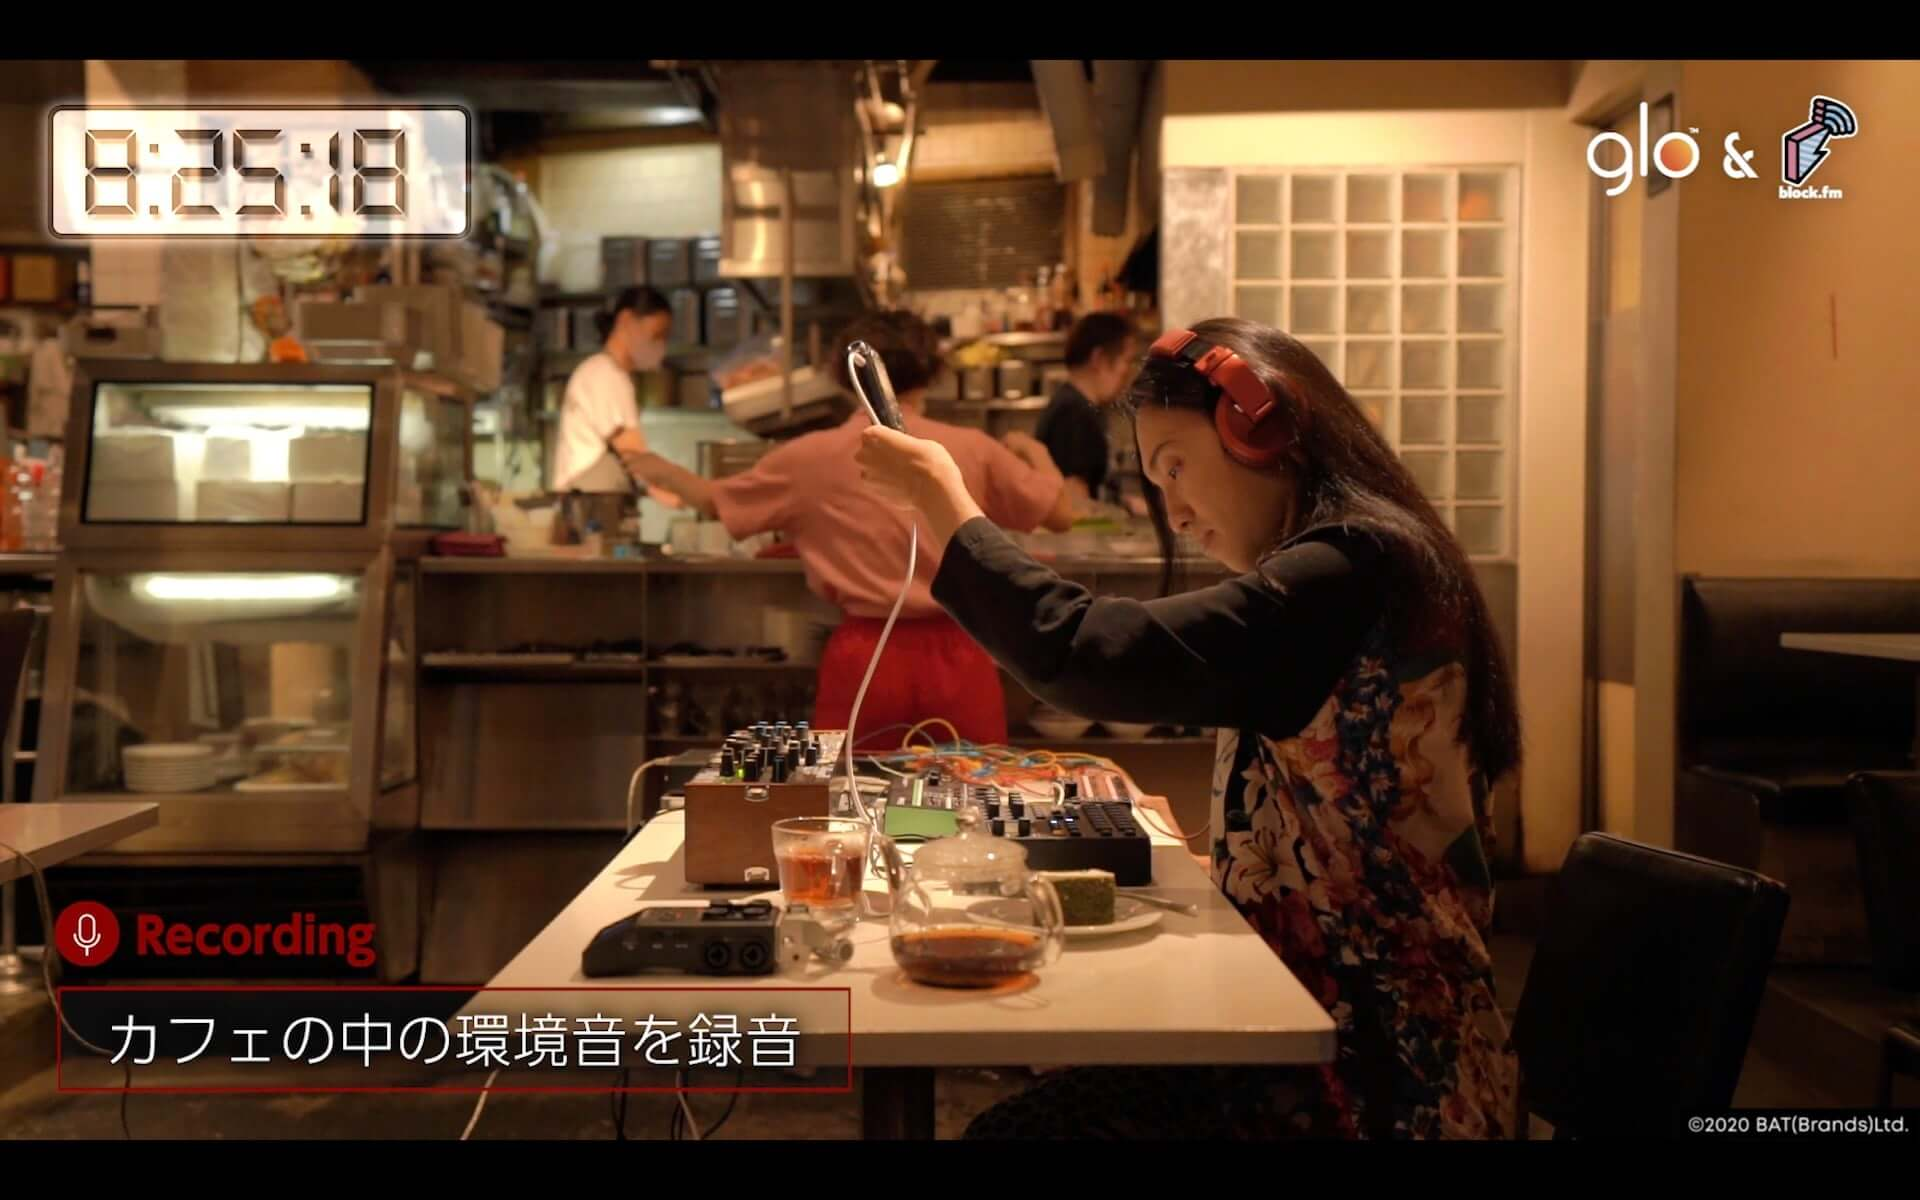 Seiho、tofubeats、Yamato、☆Taku Takahashiが様々なお題に挑戦!glo™とblock.fmが贈る動画シリーズが公開 music200916_glo-blockfm_9-1920x1200